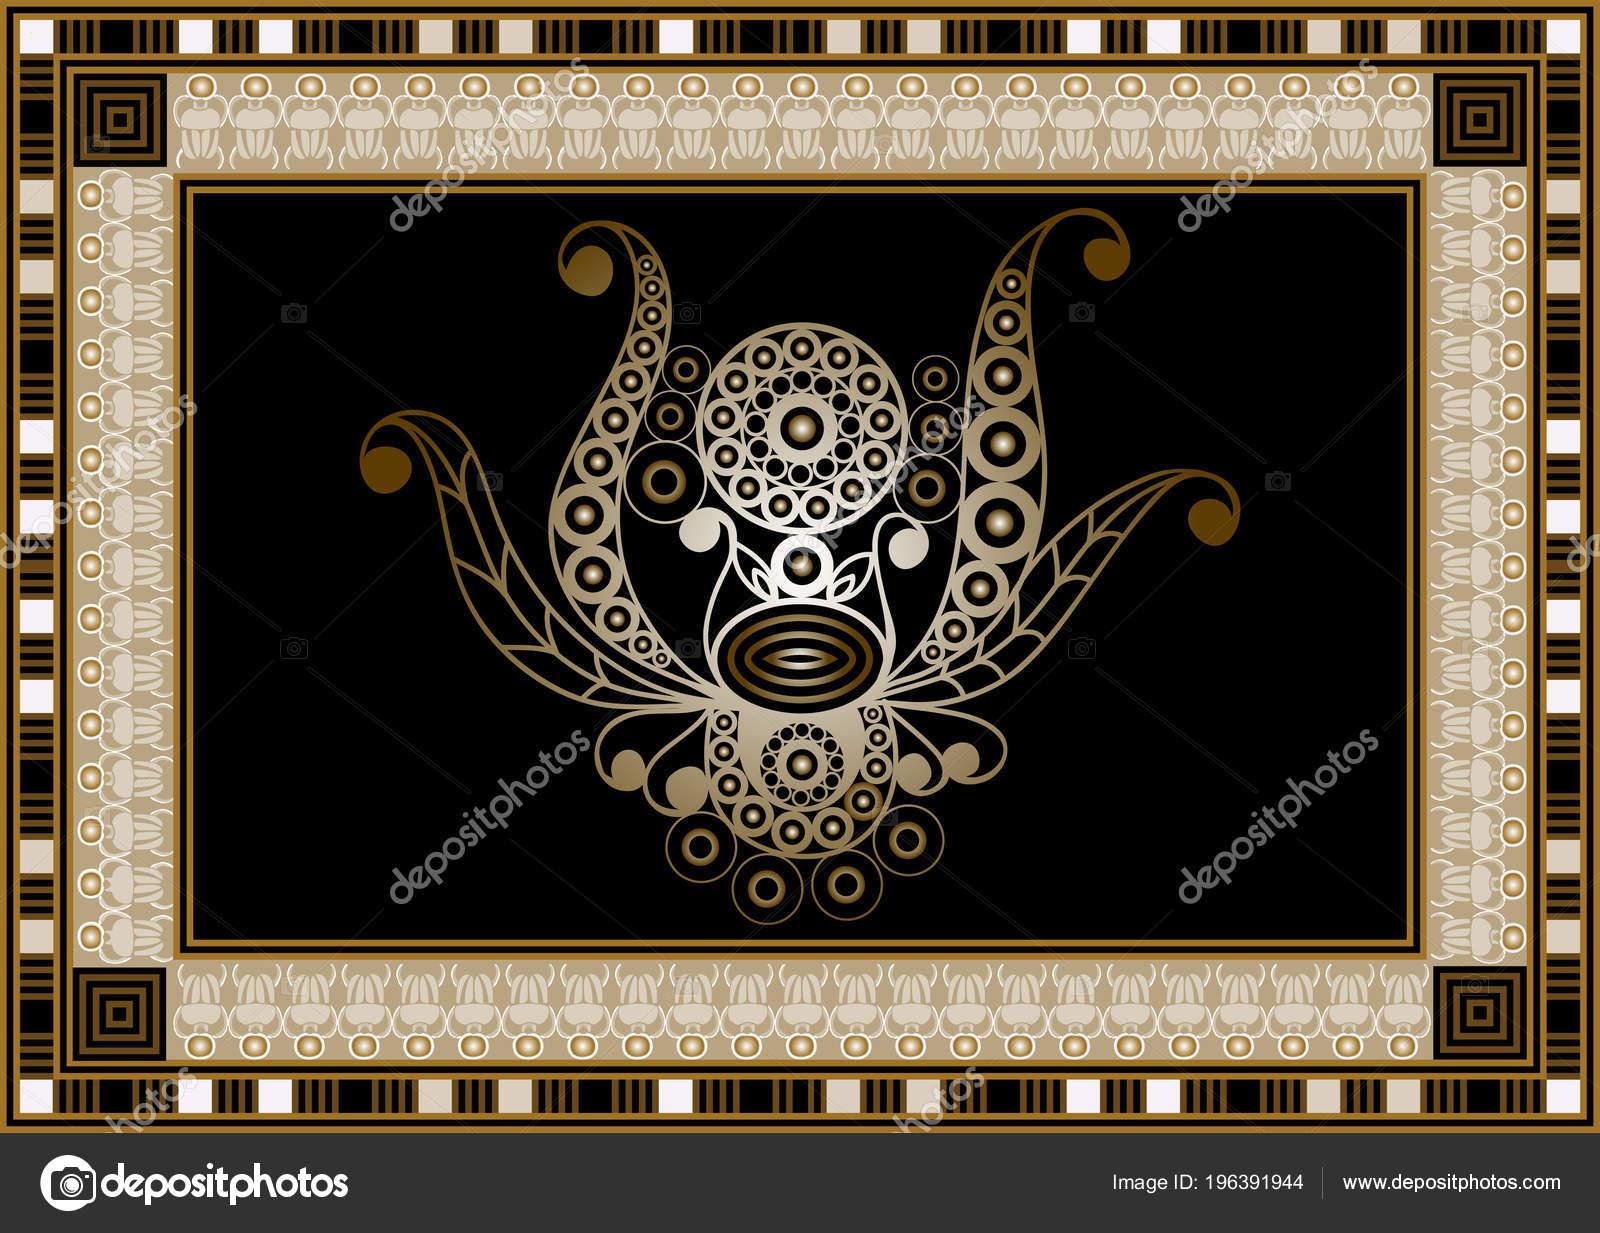 Graphic Abstract Design Occult Symbol Masonic Freemasonic Drawing